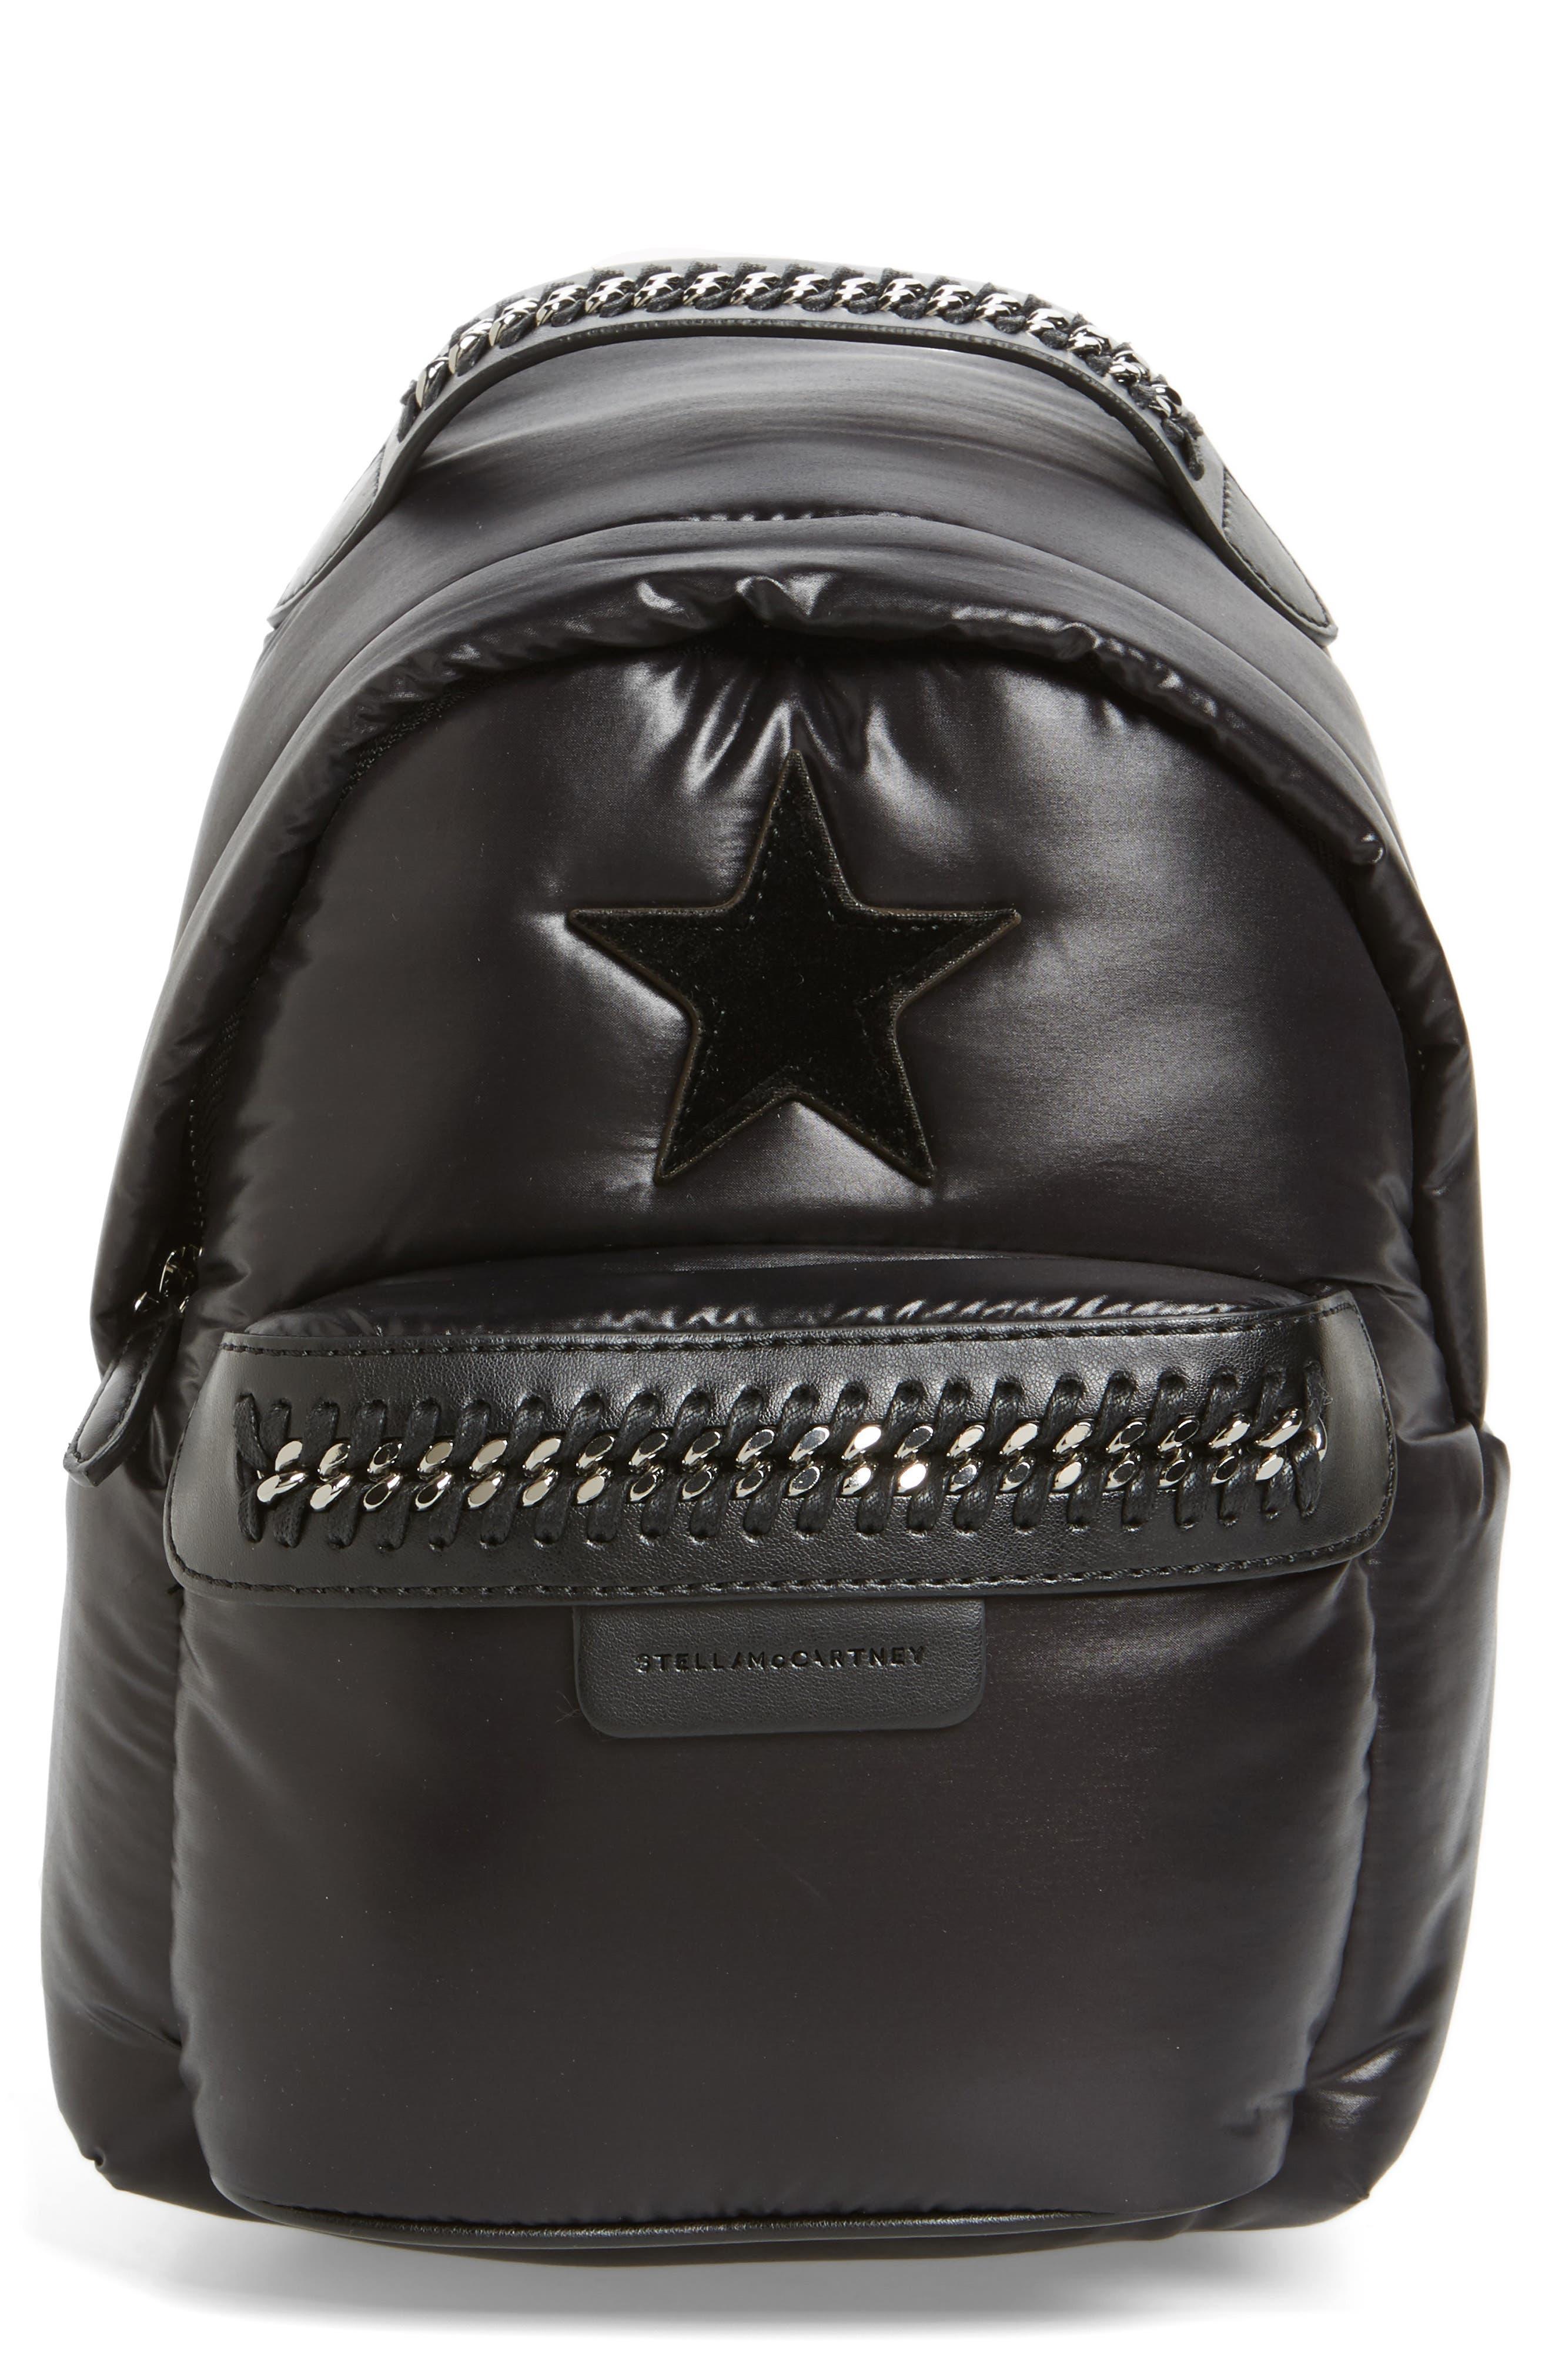 Main Image - Stella McCartney Mini Falabella Go Star Backpack